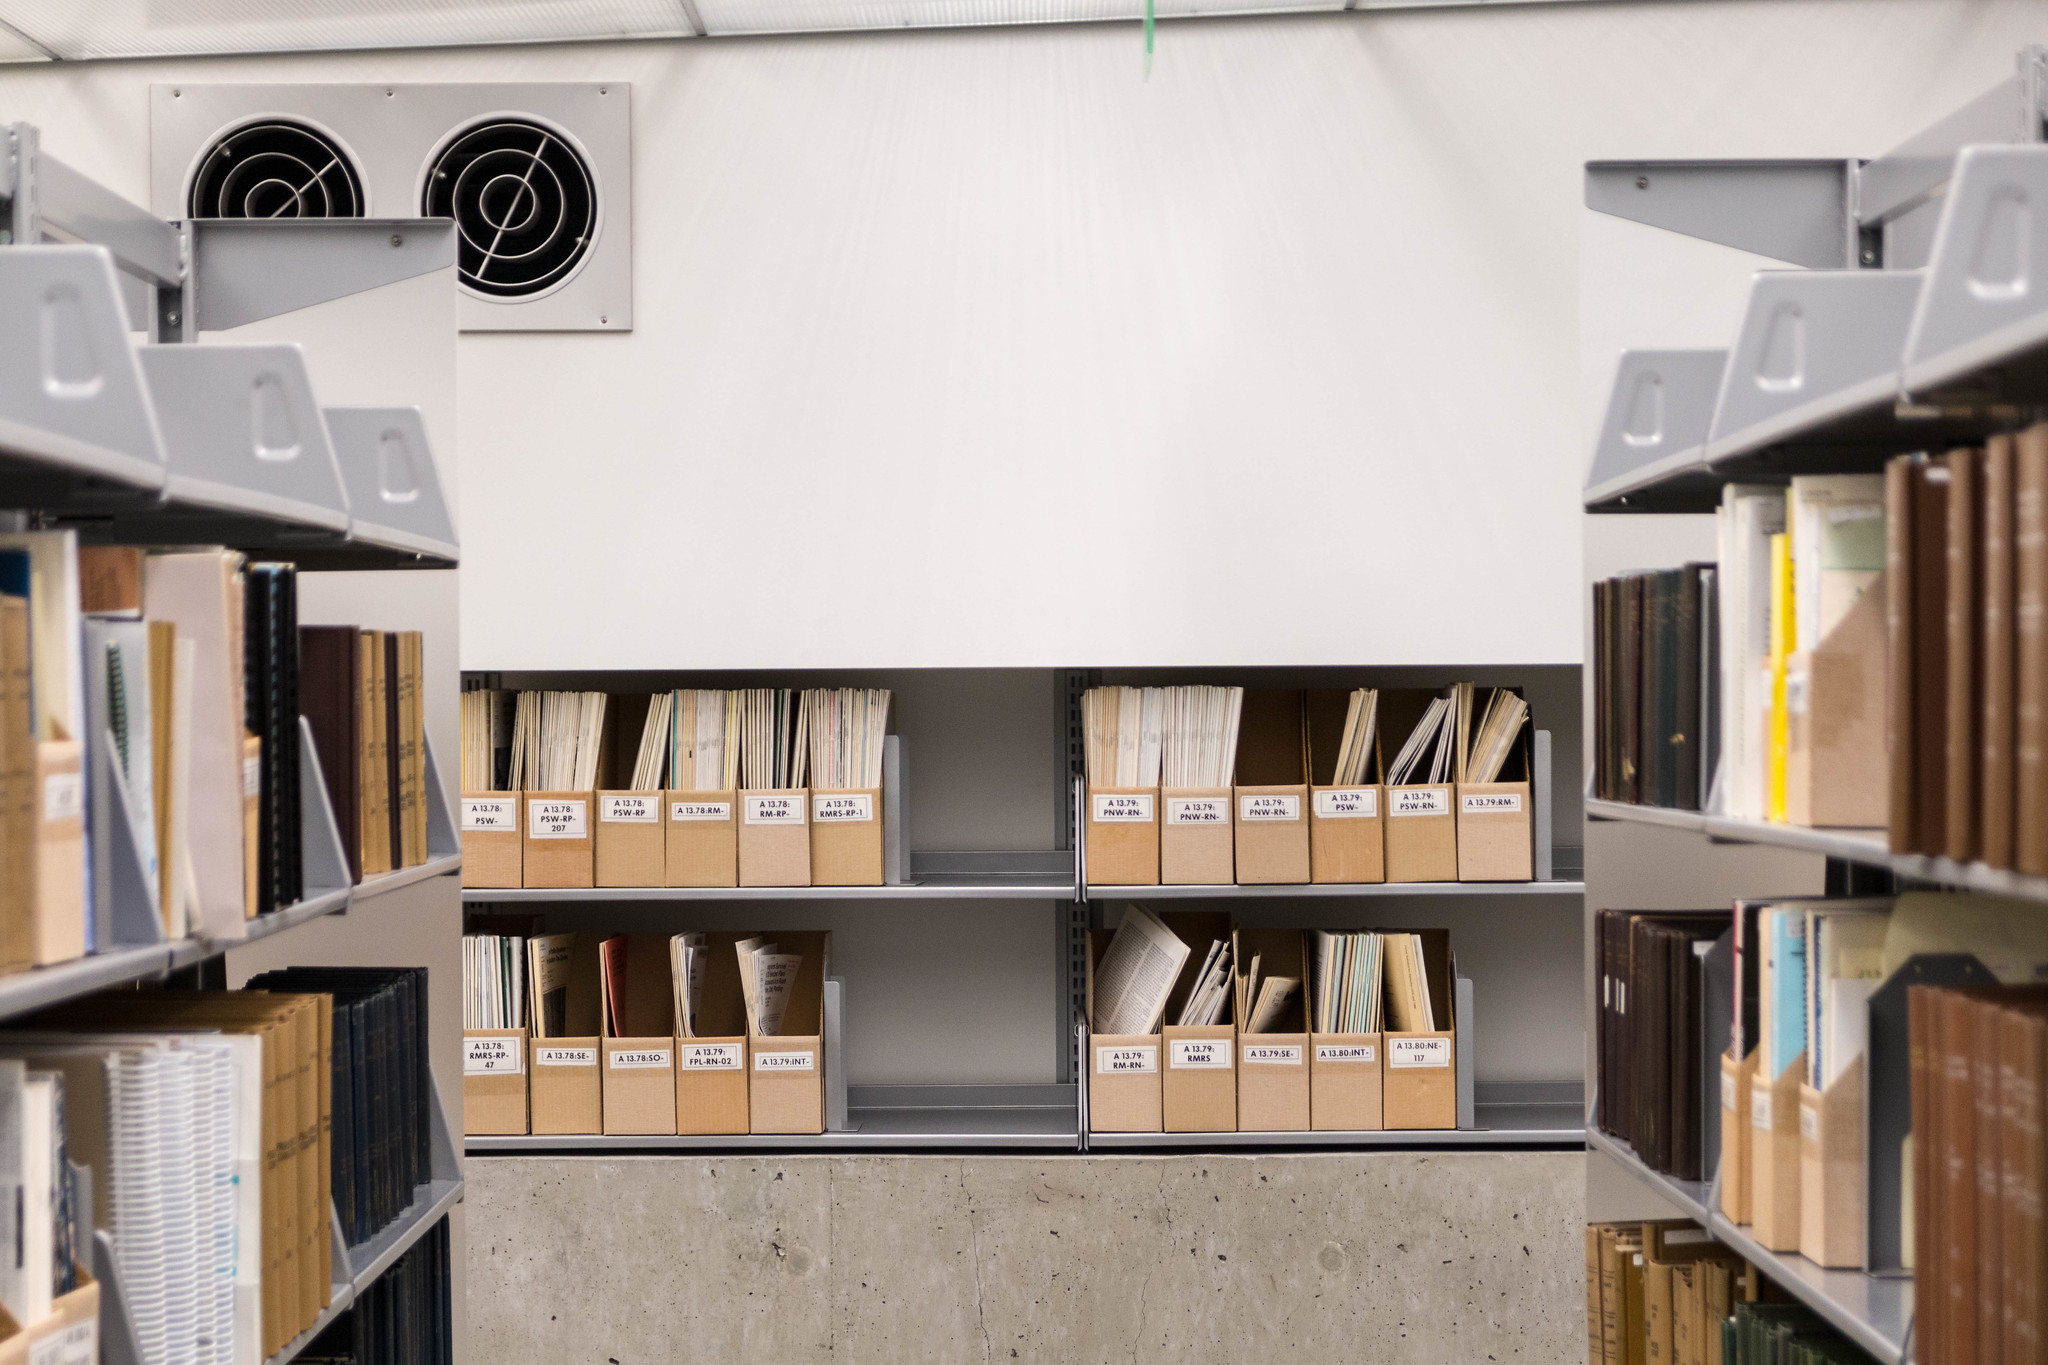 Files on the shelf